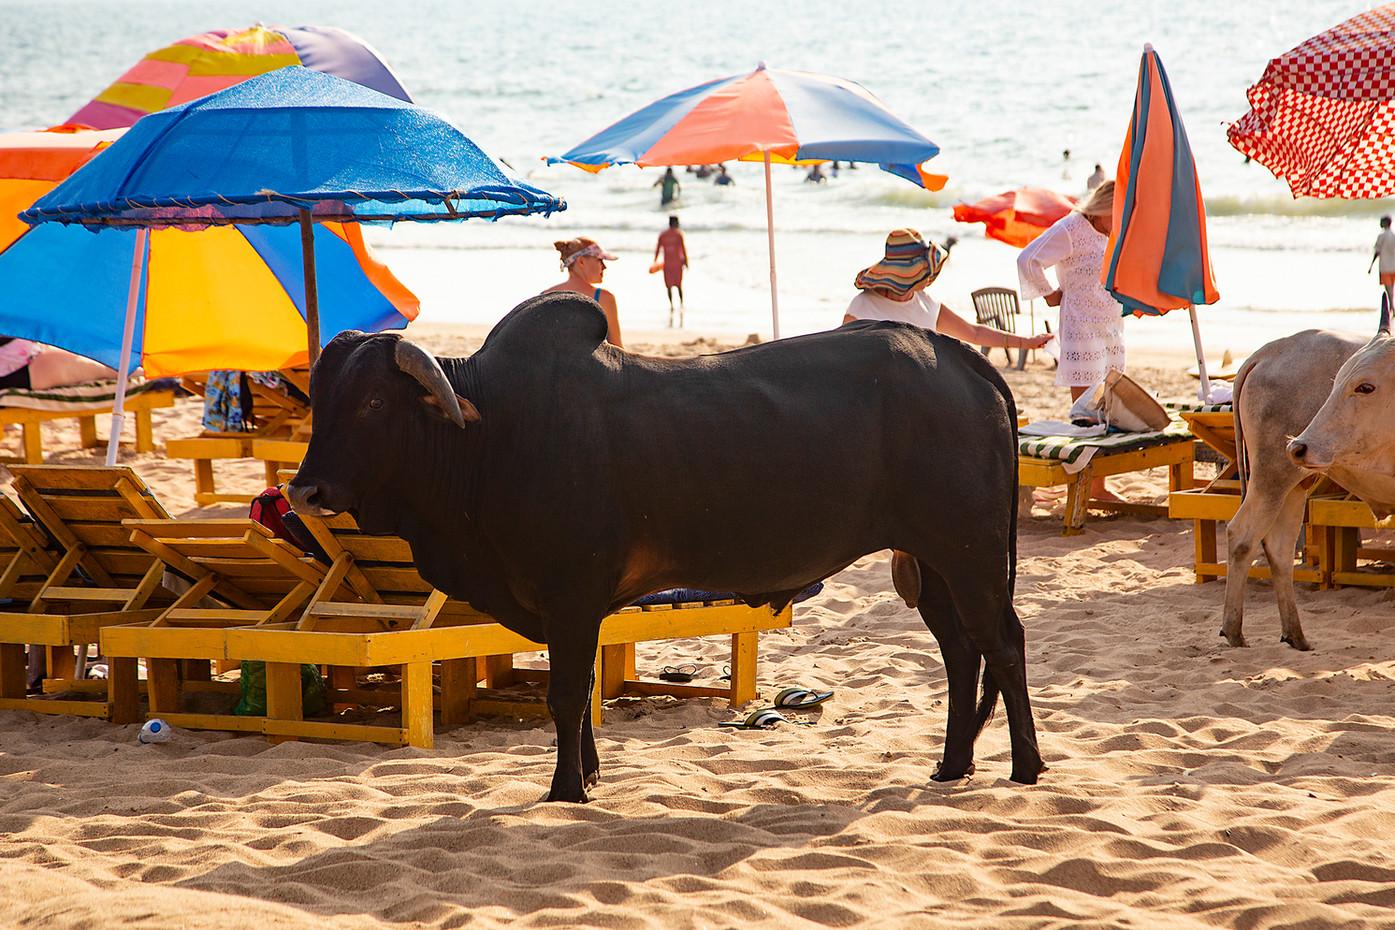 Cows on a beach in Goa, India